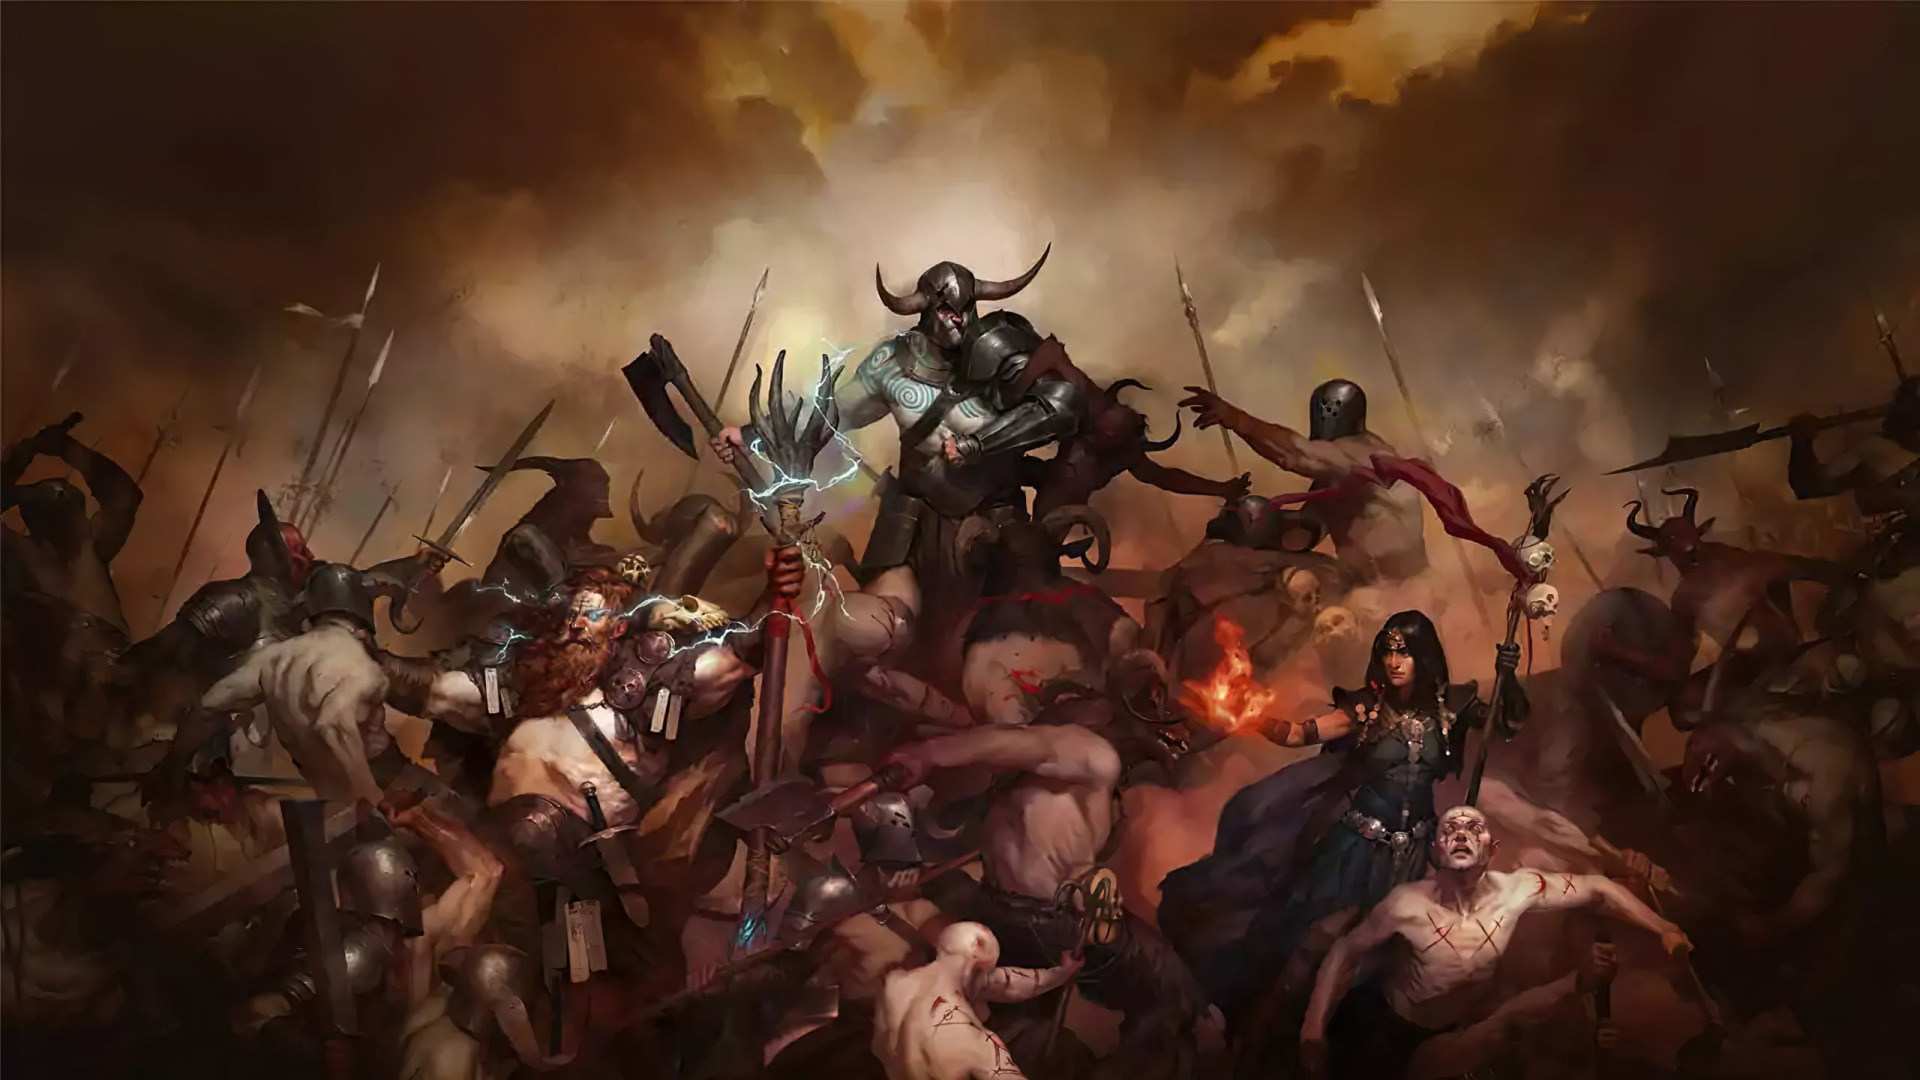 Blizzard, Diablo, Diablo 4, Blizzard Entertainment, Diablo IV